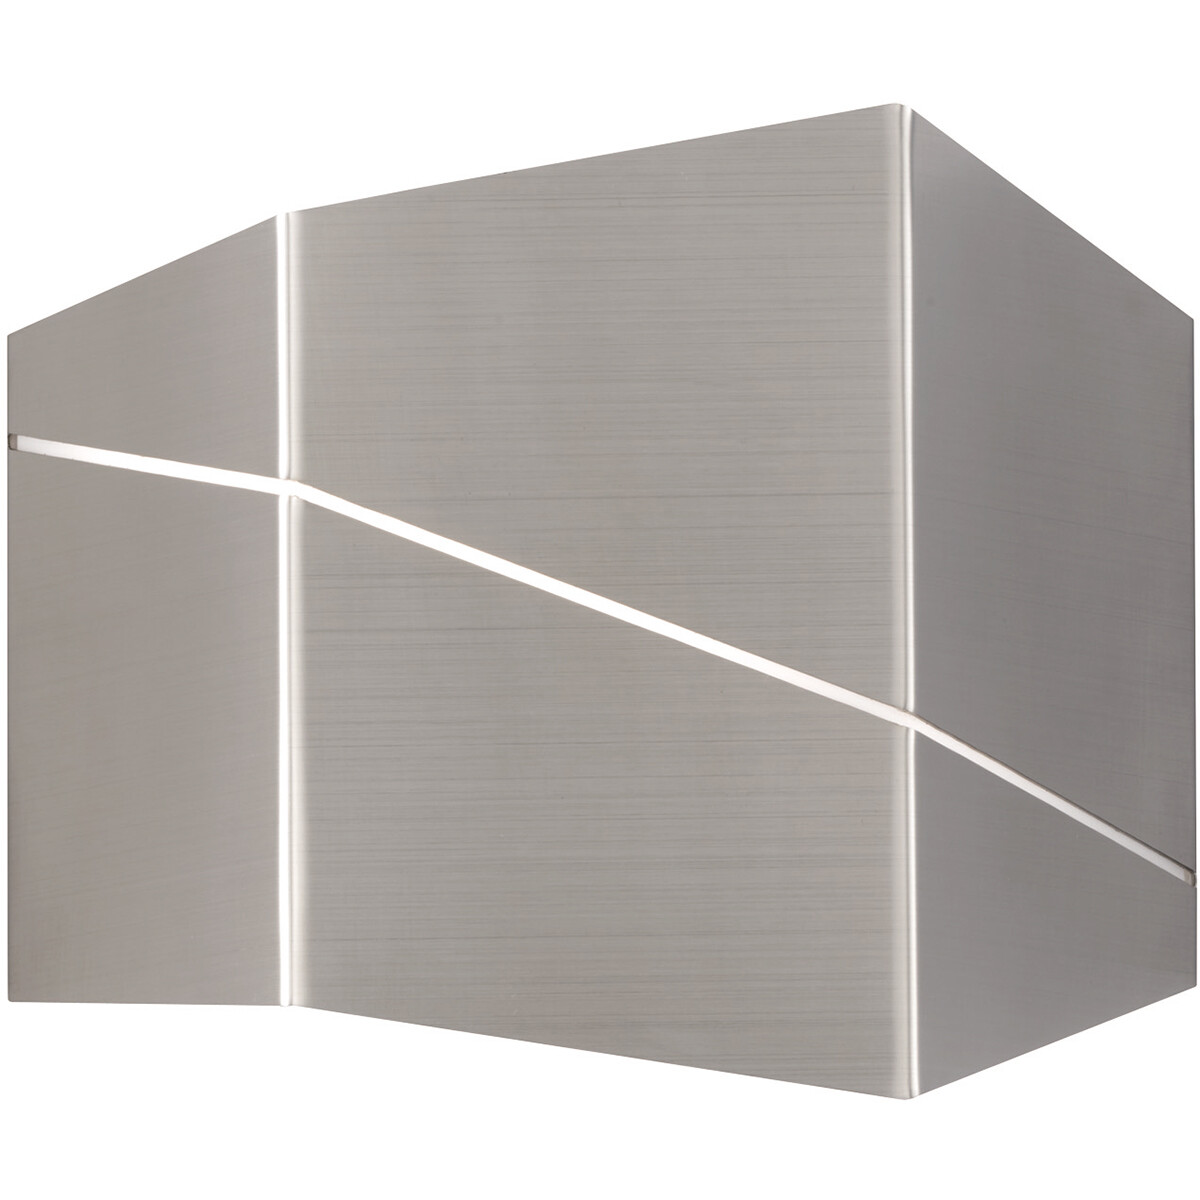 LED Wandlamp - Wandverlichting - Trion Zorran - 6W - Warm Wit 3000K - Rechthoek - Mat Nikkel - Alumi